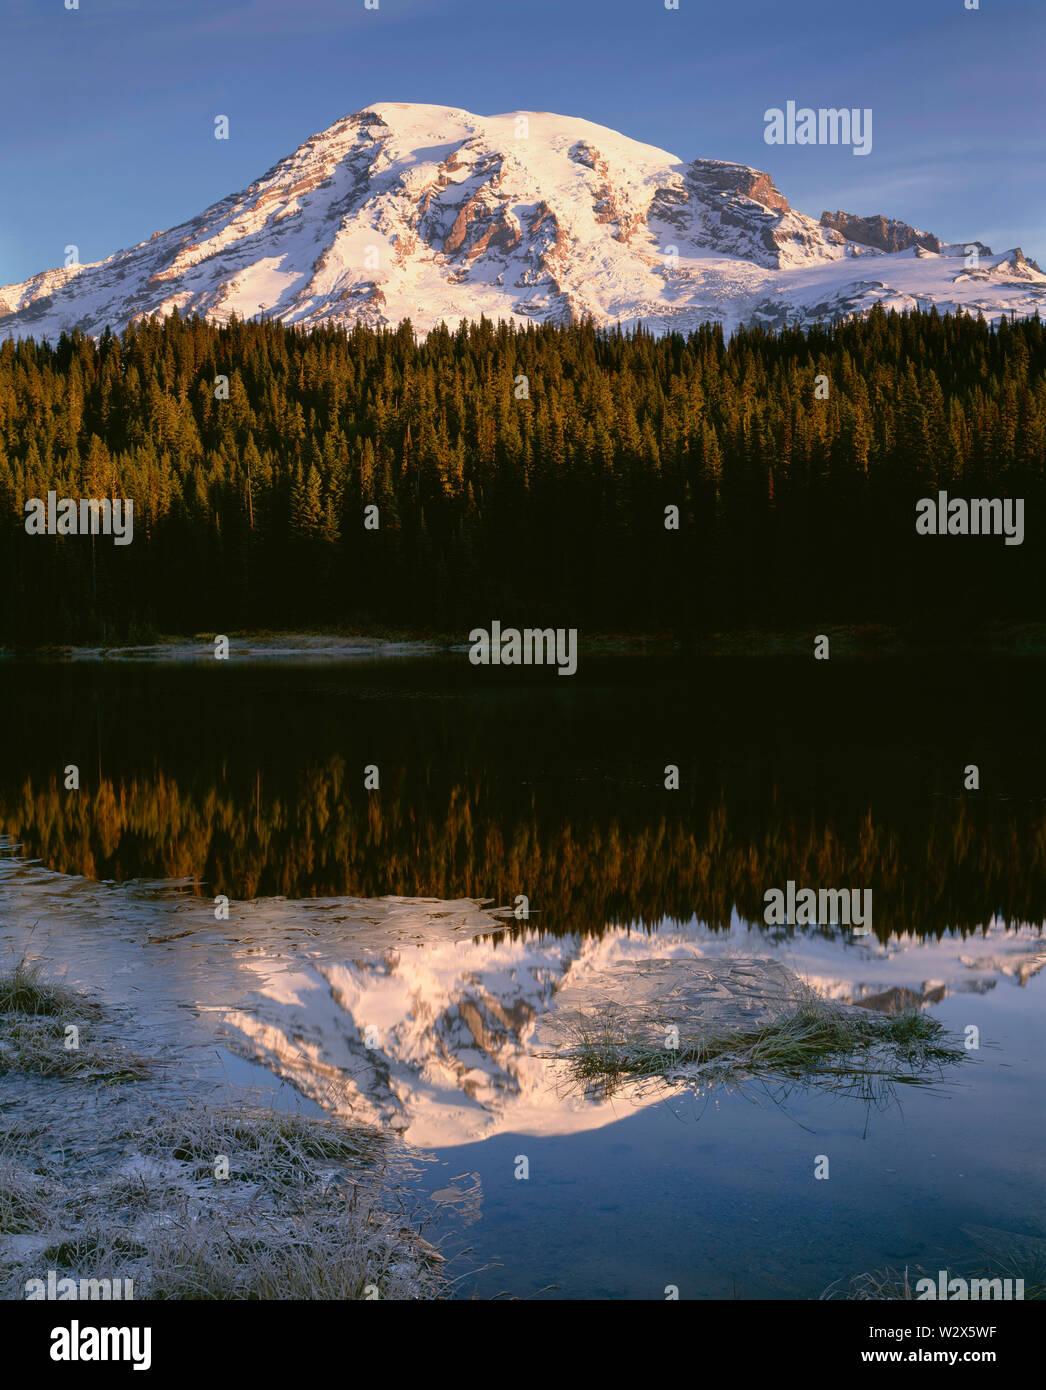 USA, Washington, Mt. Rainier National Park, Autumn sunrise on Mt. Rainier reflects in ice rimmed Reflection Lake. - Stock Image